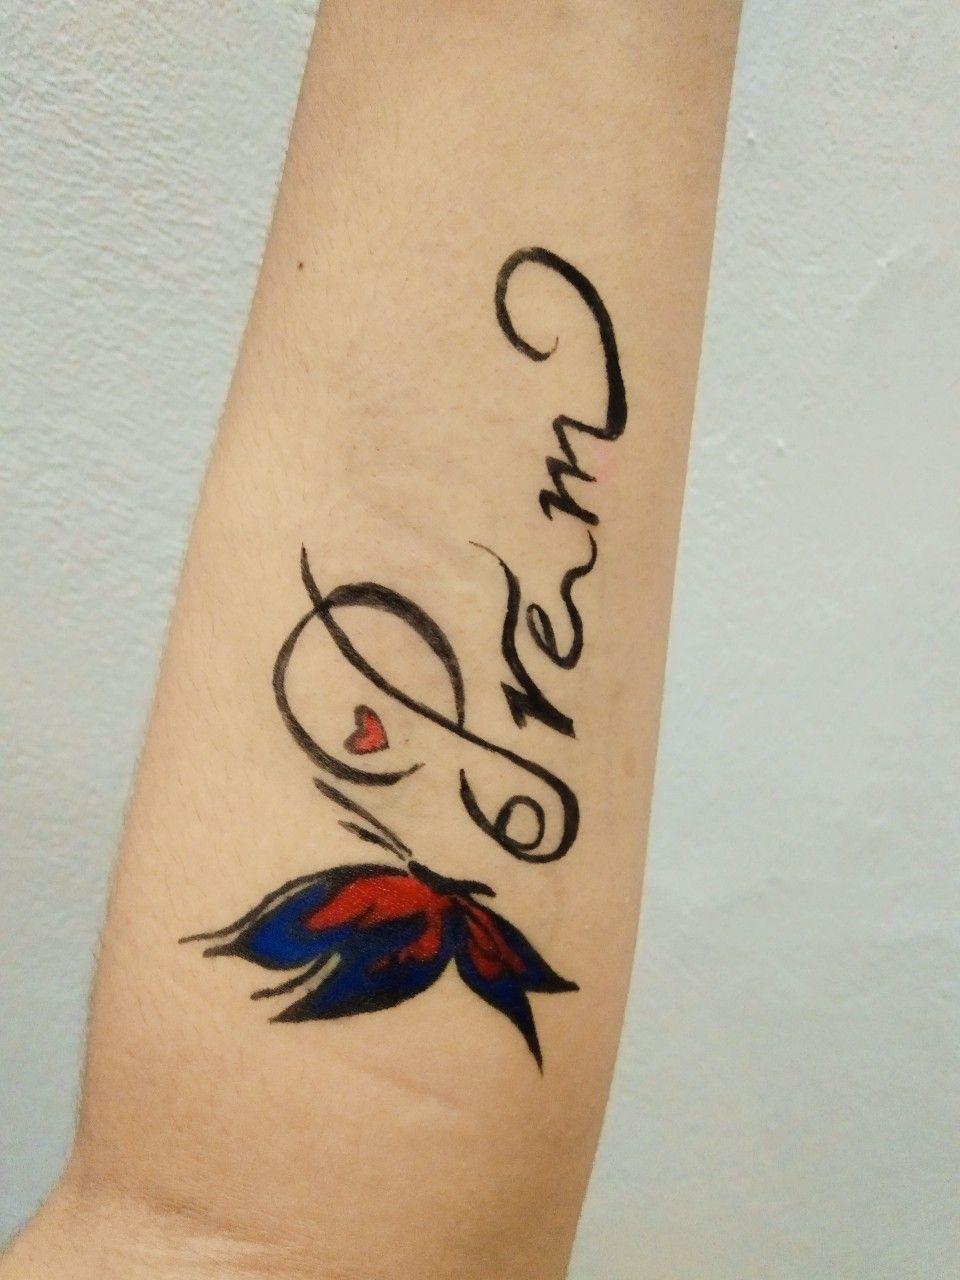 Pin By Premkumar Darade On Tattoo Design In 2020 Name Tattoo Designs Name Tattoo Tattoos